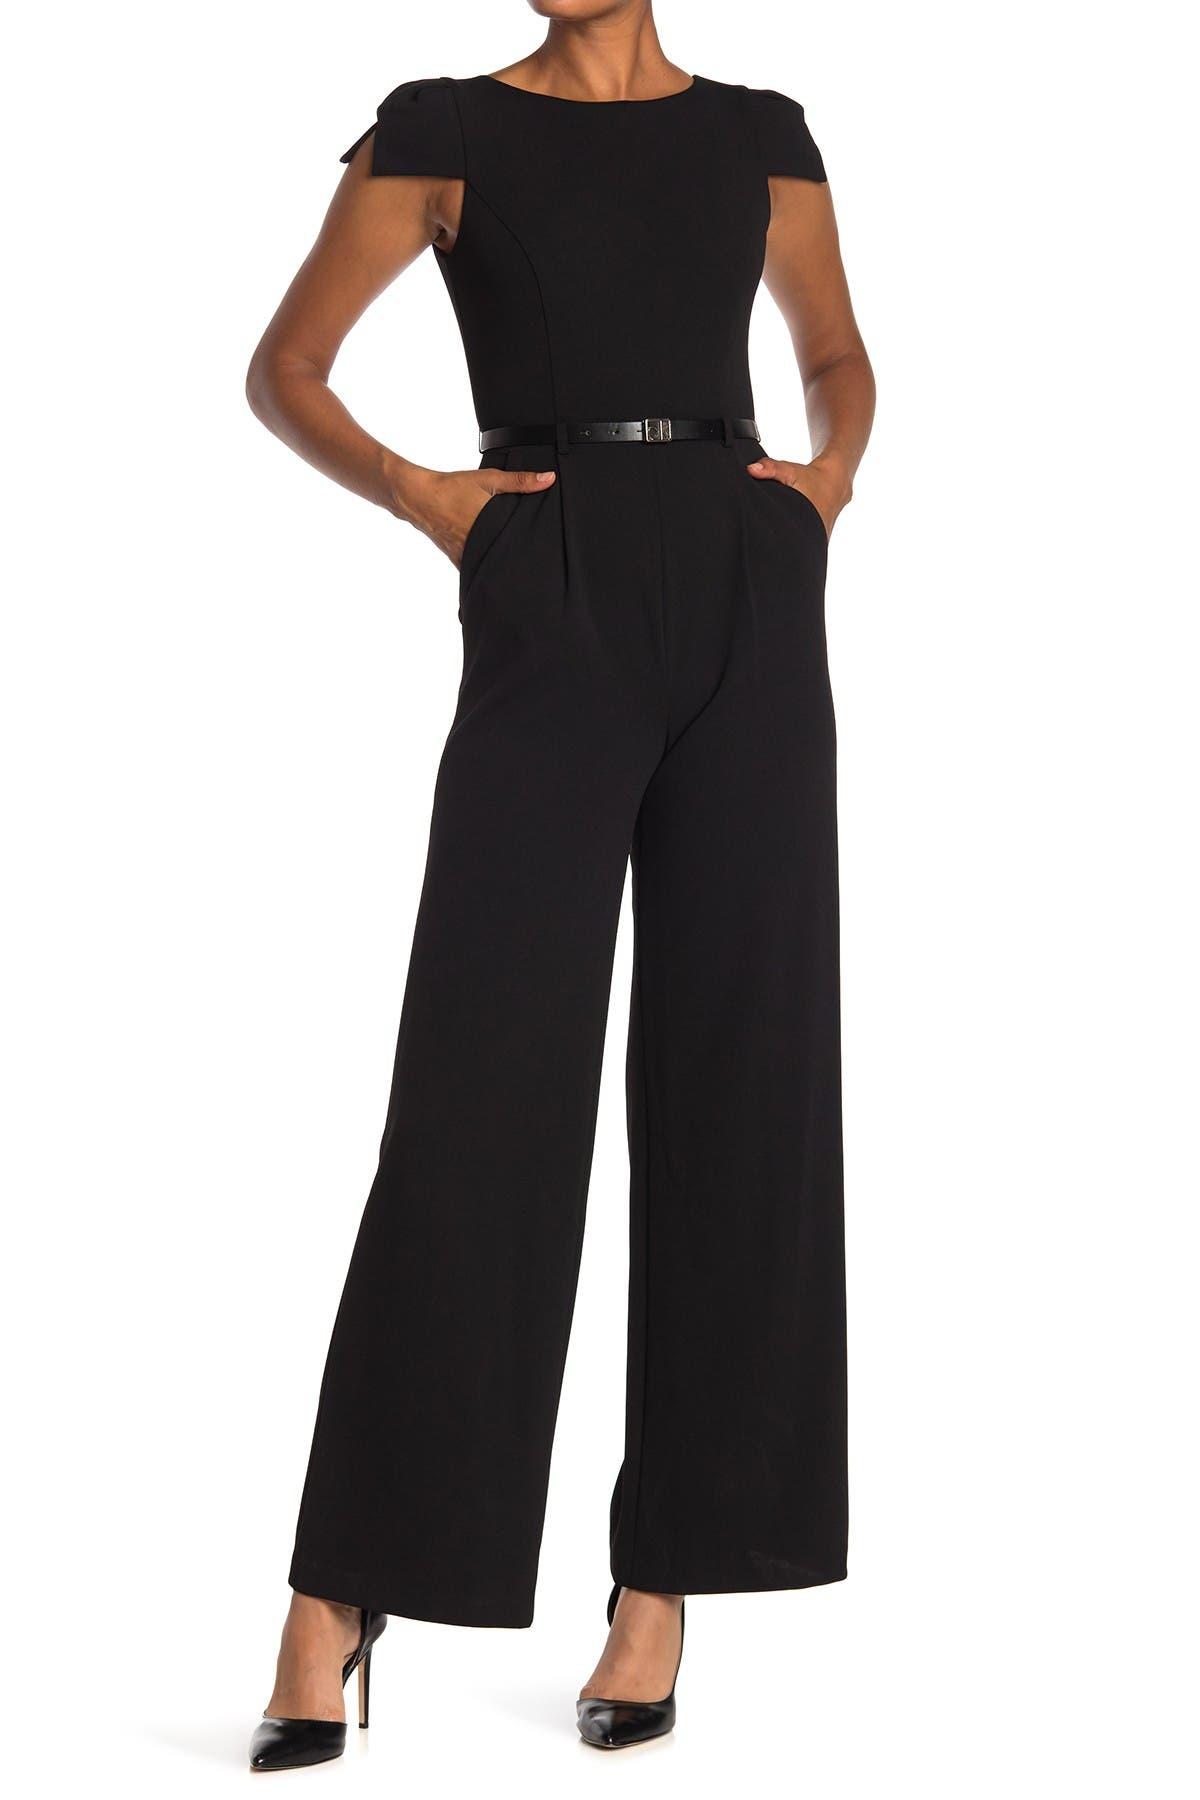 Image of Calvin Klein Cap Sleeve Belted Jumpsuit